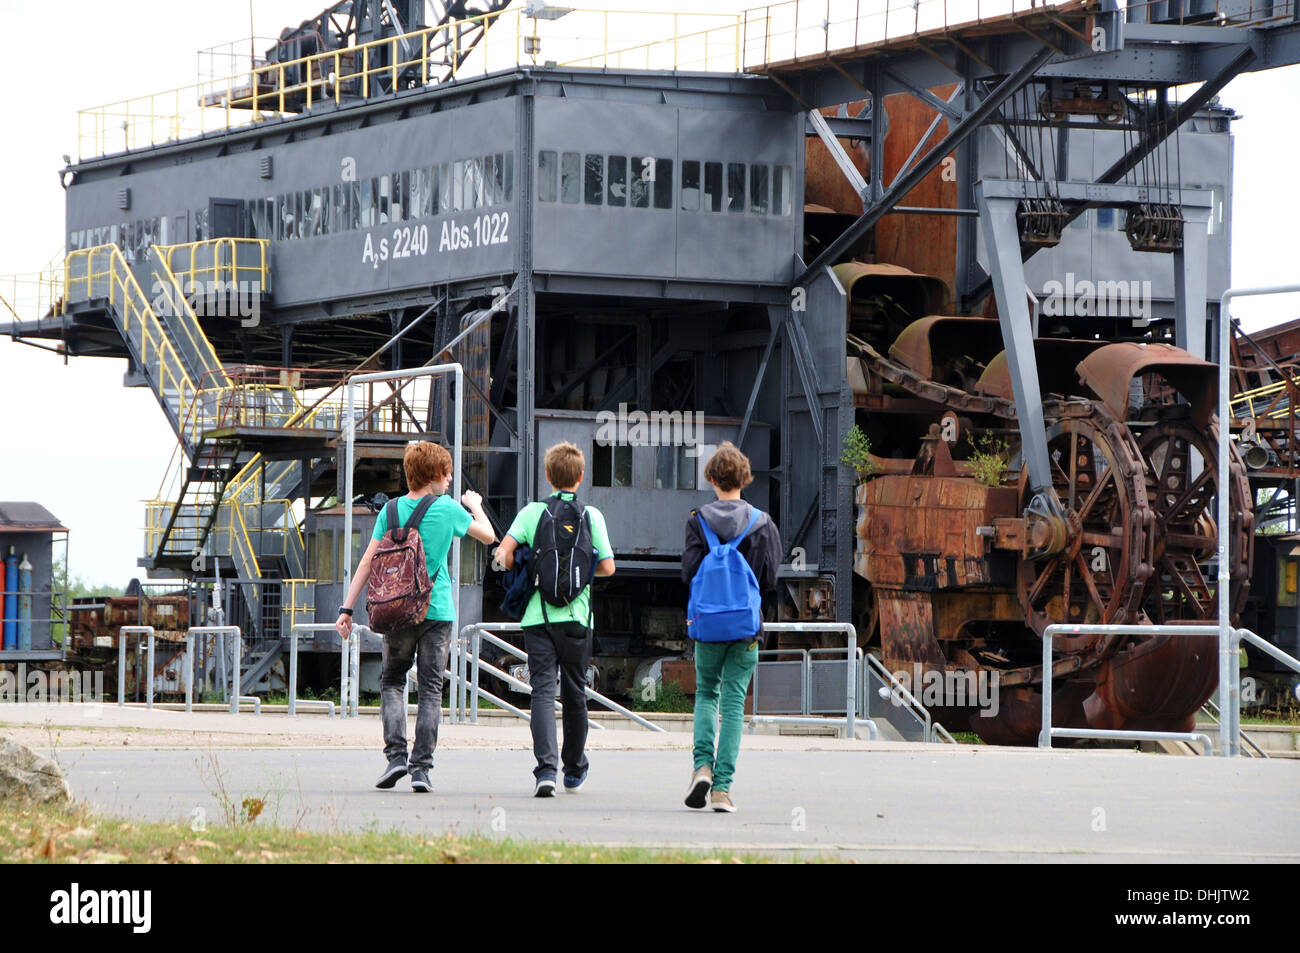 Brown coal museum Ferropolis, Saxony-Anhalt, Germany, Europe Stock Photo